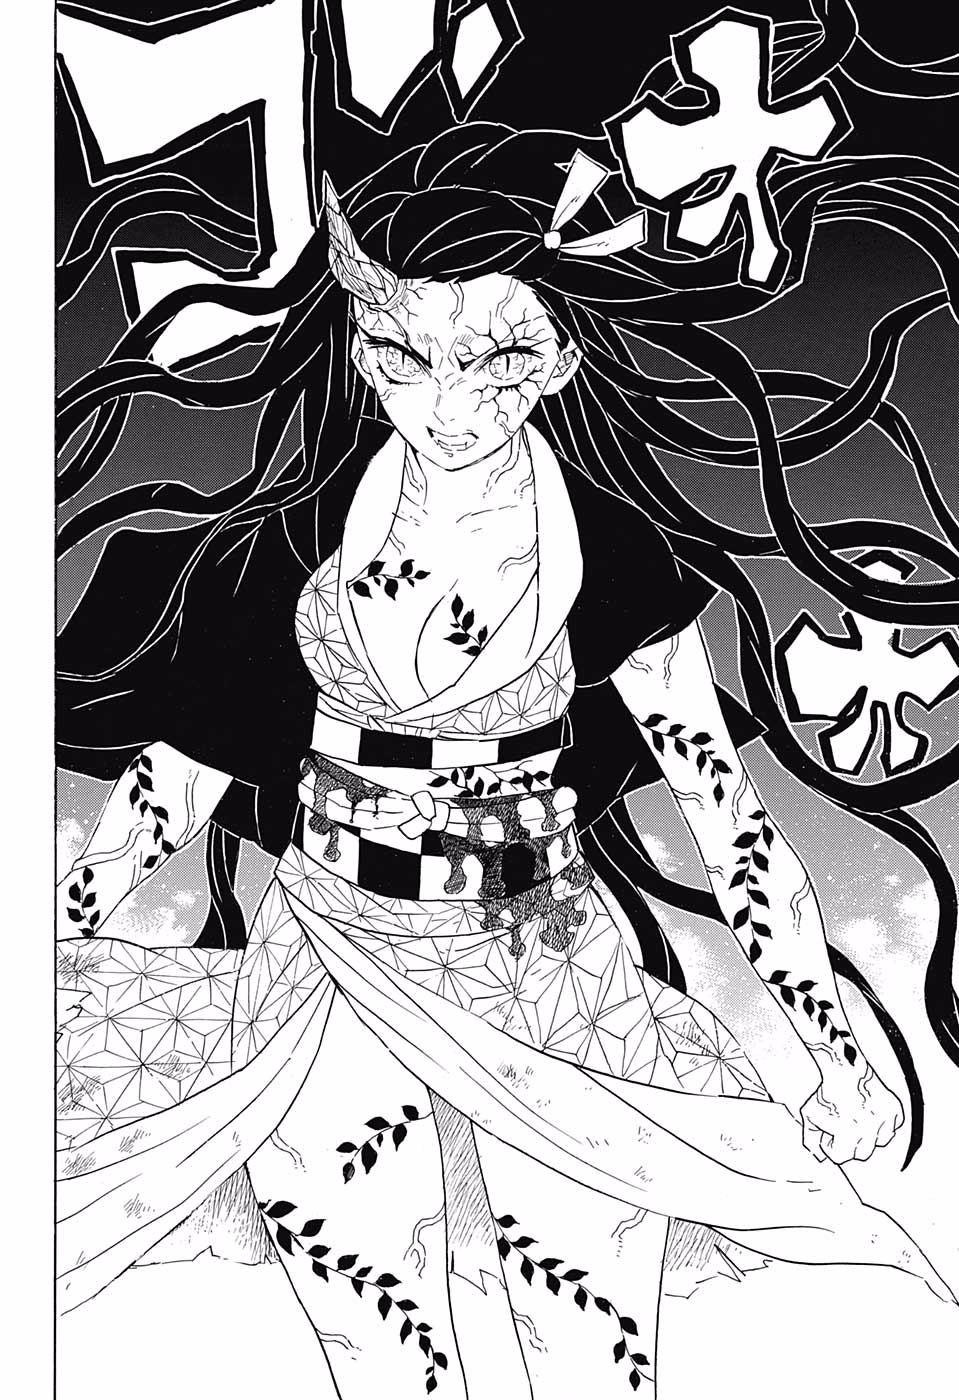 Read manga Kimetsu no Yaiba Ch.083 Transfiguration online